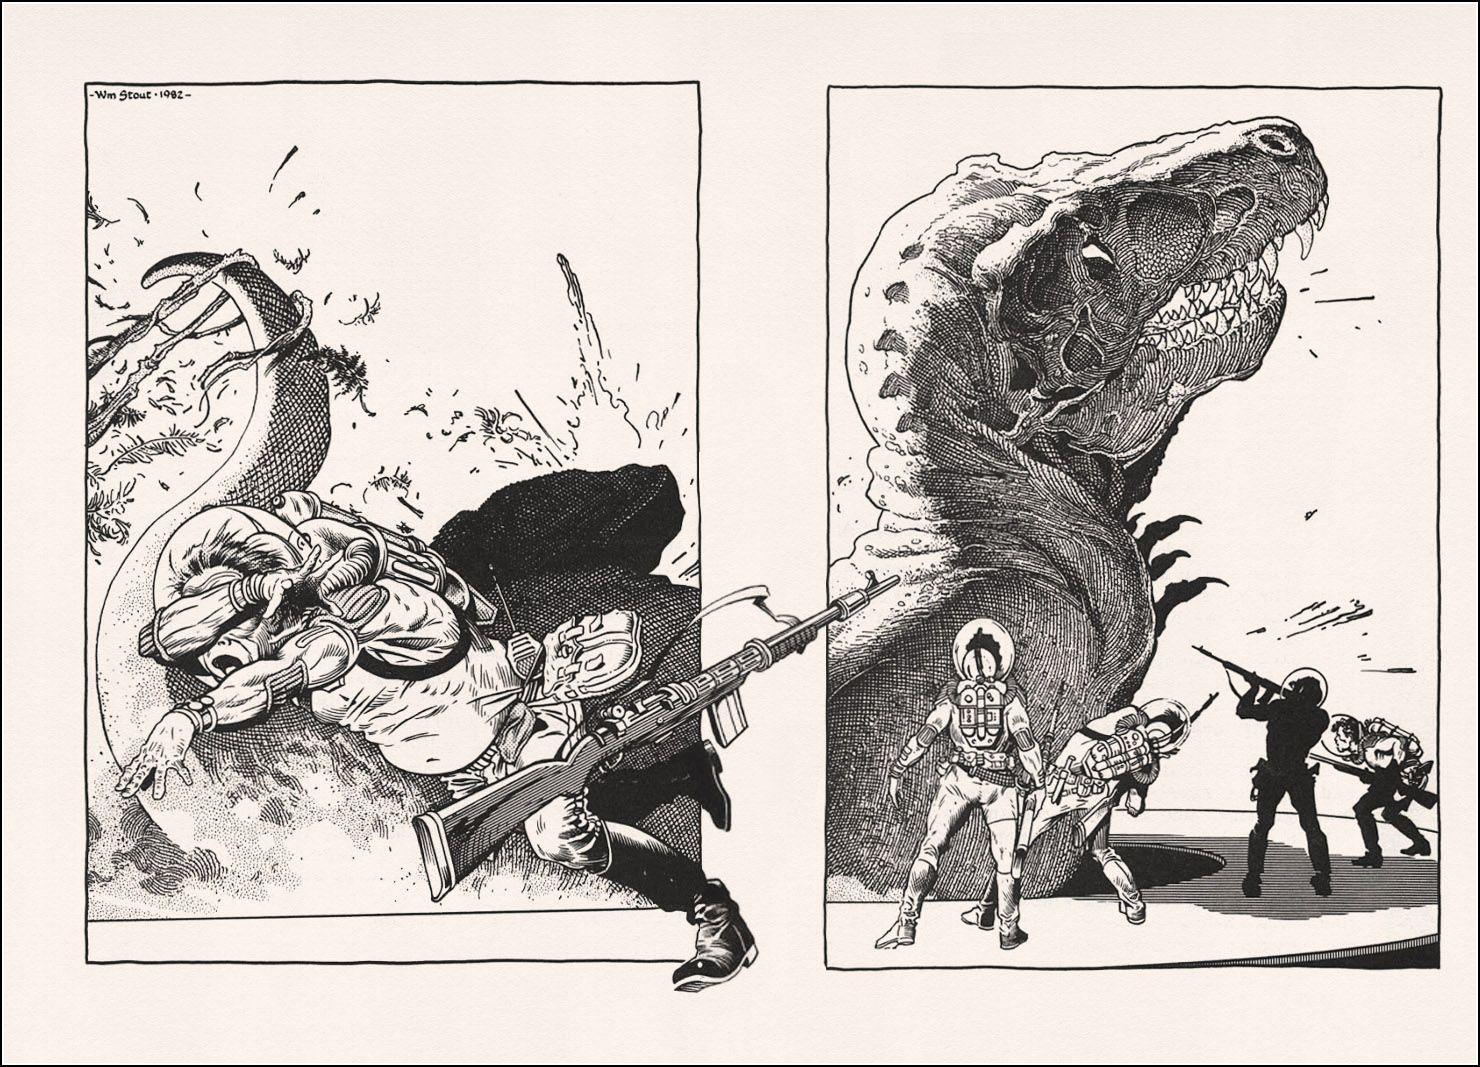 William Stout, illustration Ray Bradbury's Dinosaur Tales